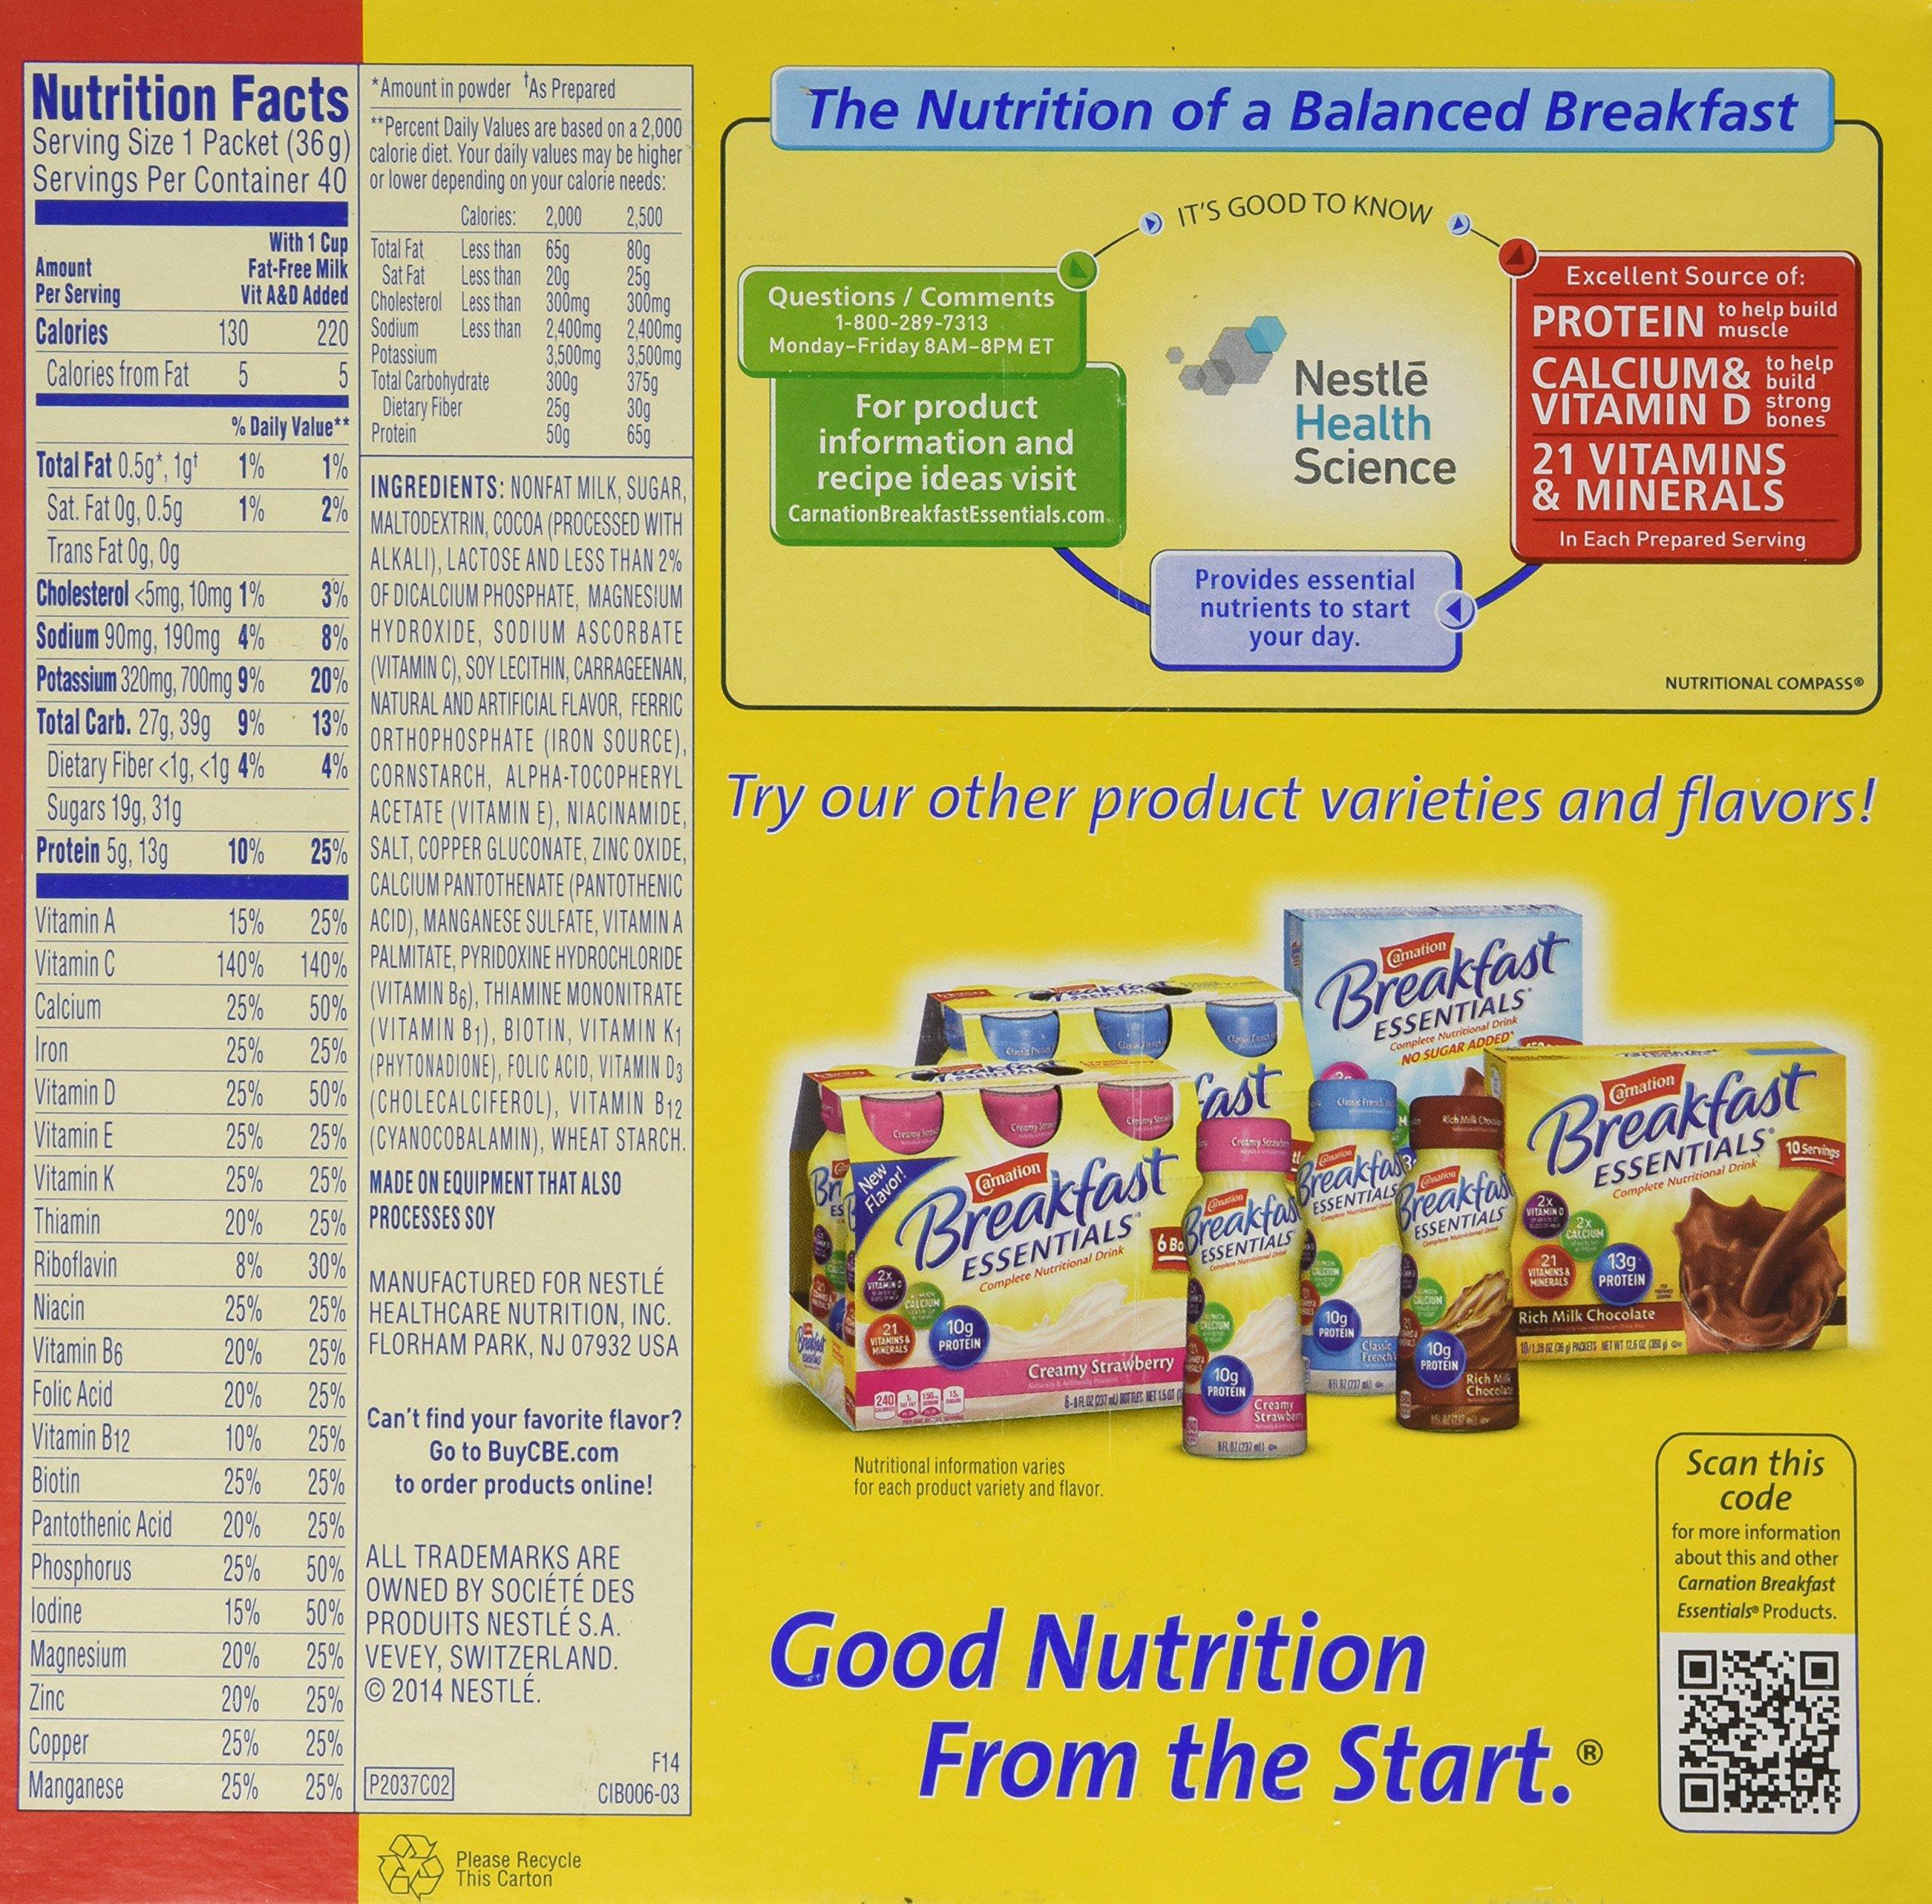 Carnation Breakfast Essentials 40-1.26oz Packets - Rich Milk Chocolate by Carnation (Image #2)